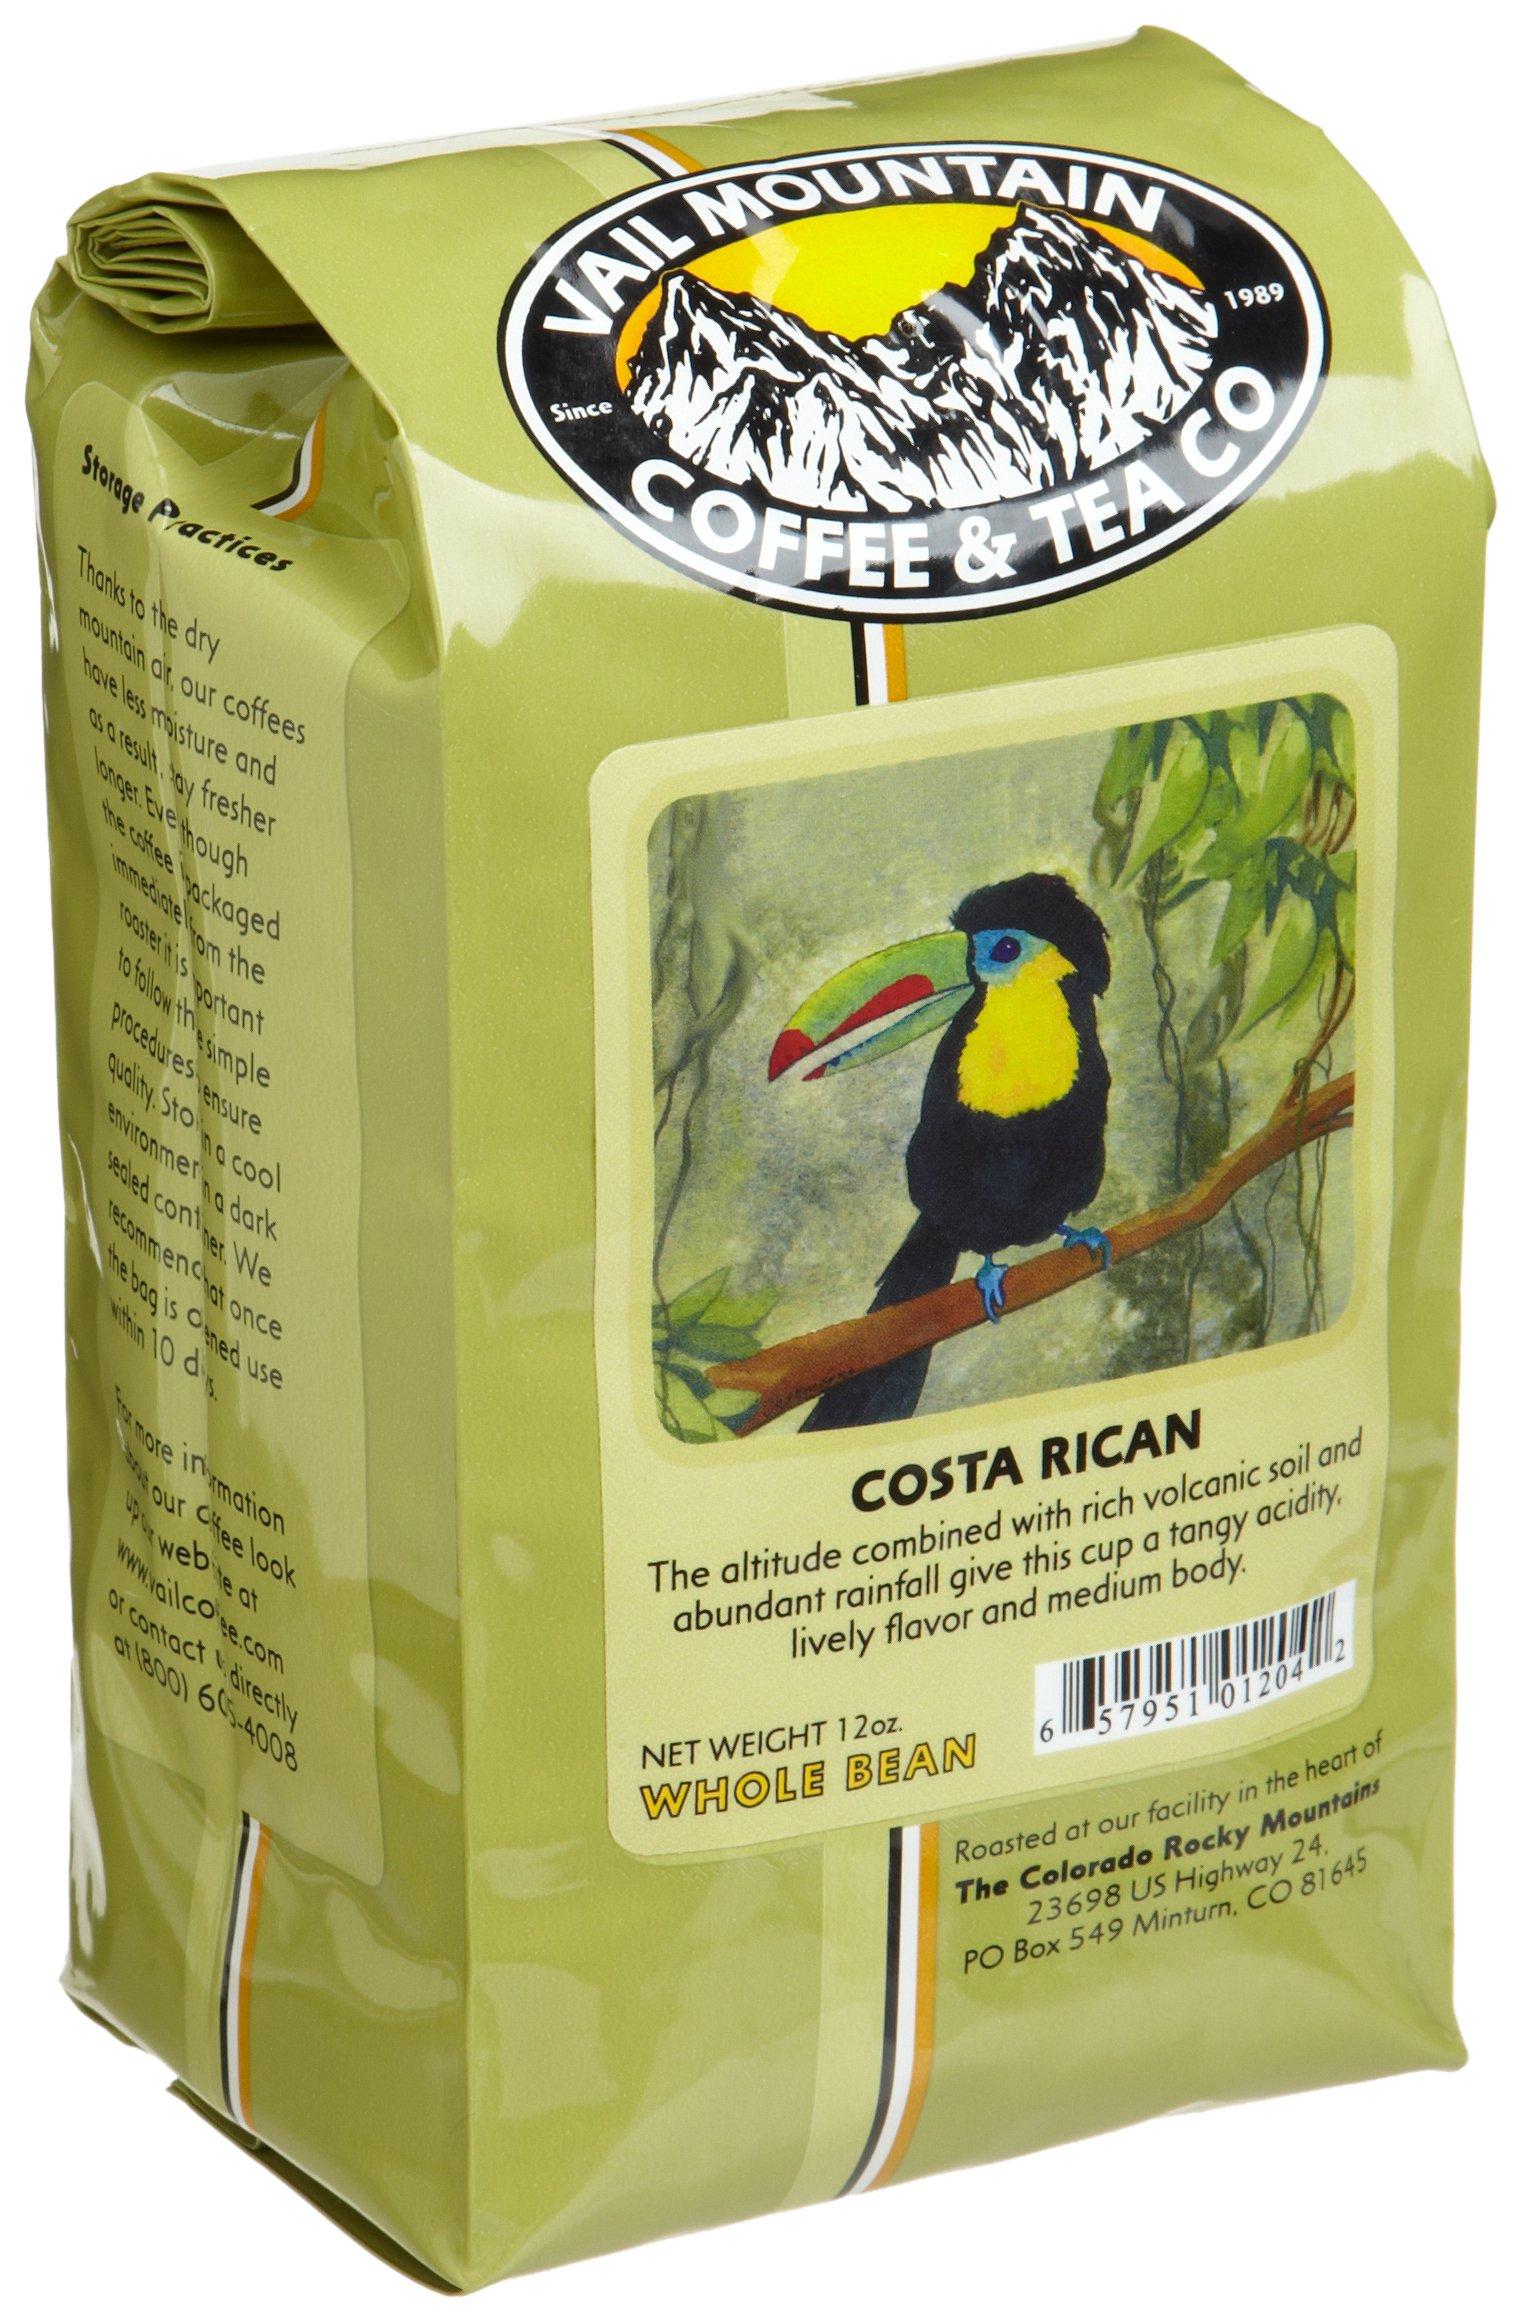 Vail Mountain Coffee & Tea Costa Rican Whole Bean Coffee, 12-Ounce Bags (Pack of 3) by Vail Mountain Coffee & Tea